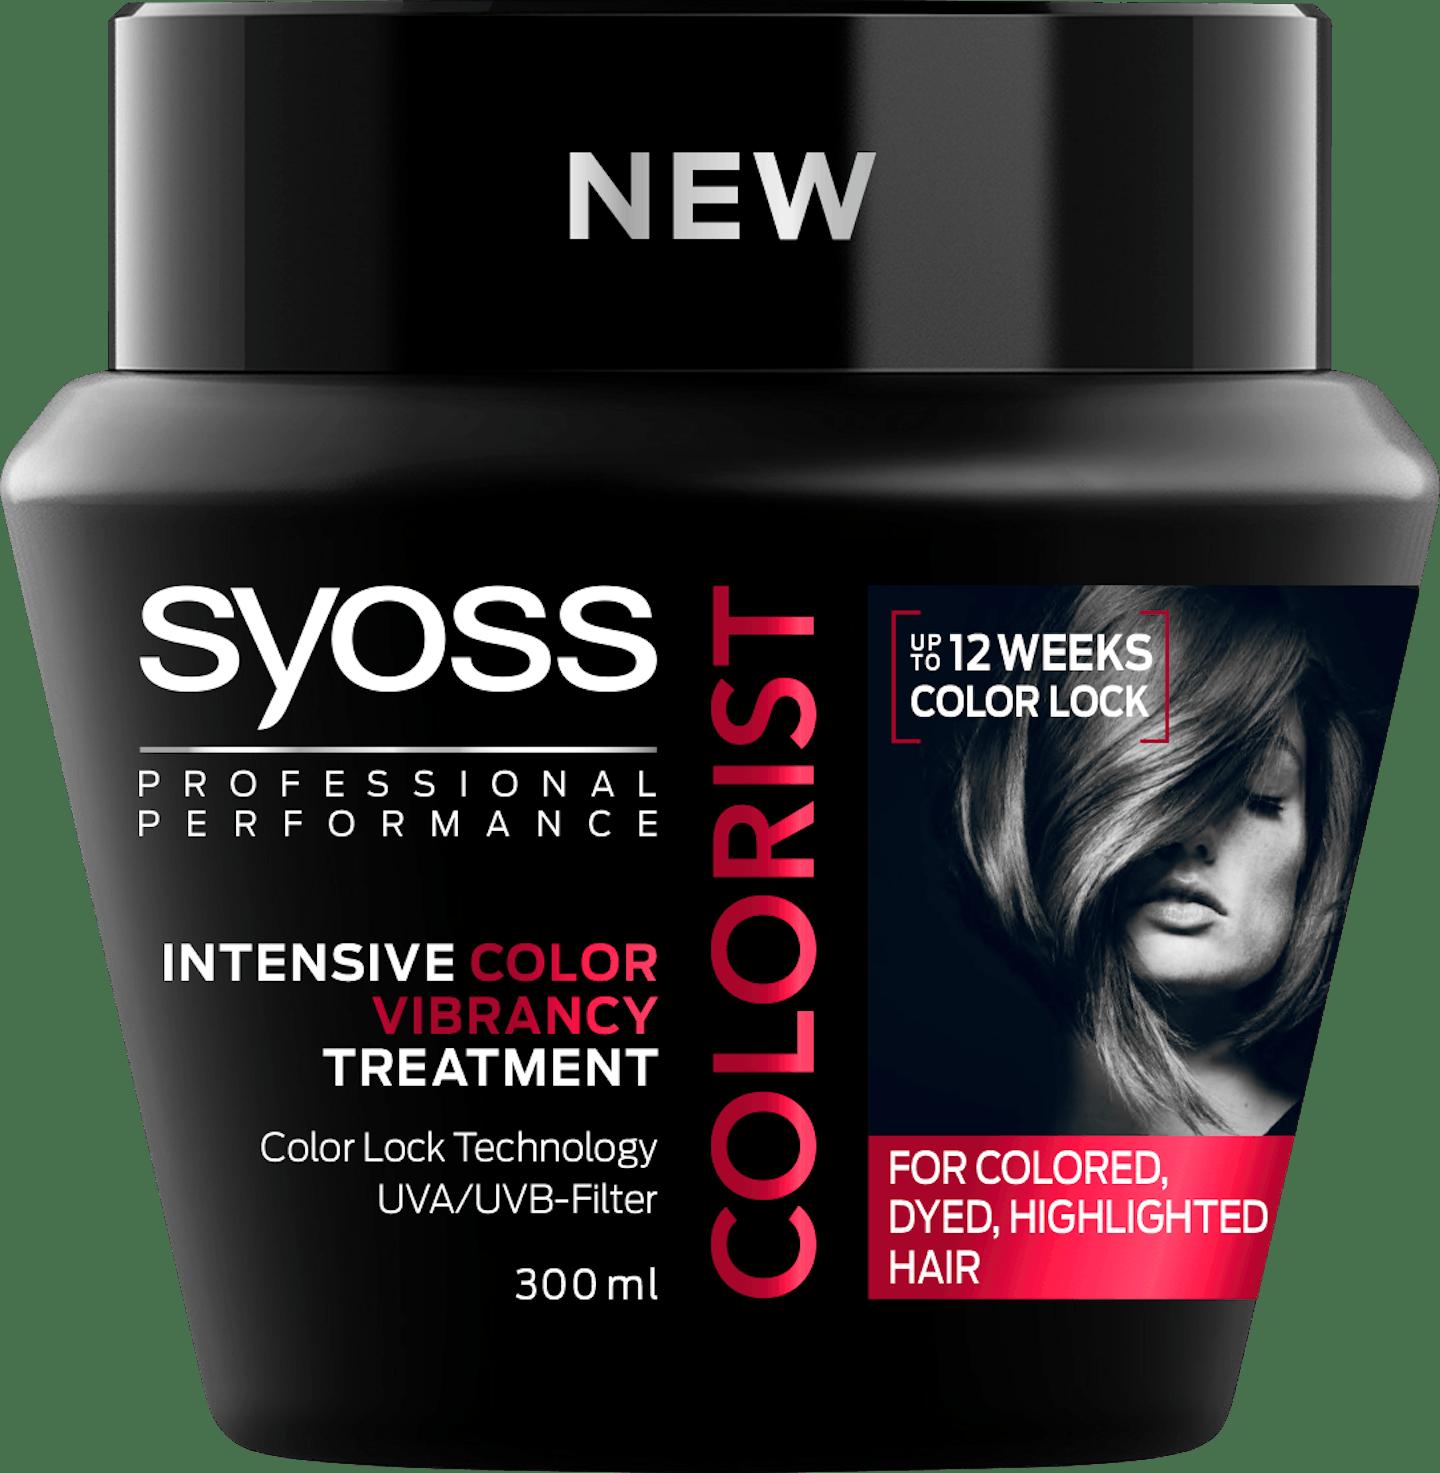 Syoss Colorist Intensive Color Vibrancy Treatment